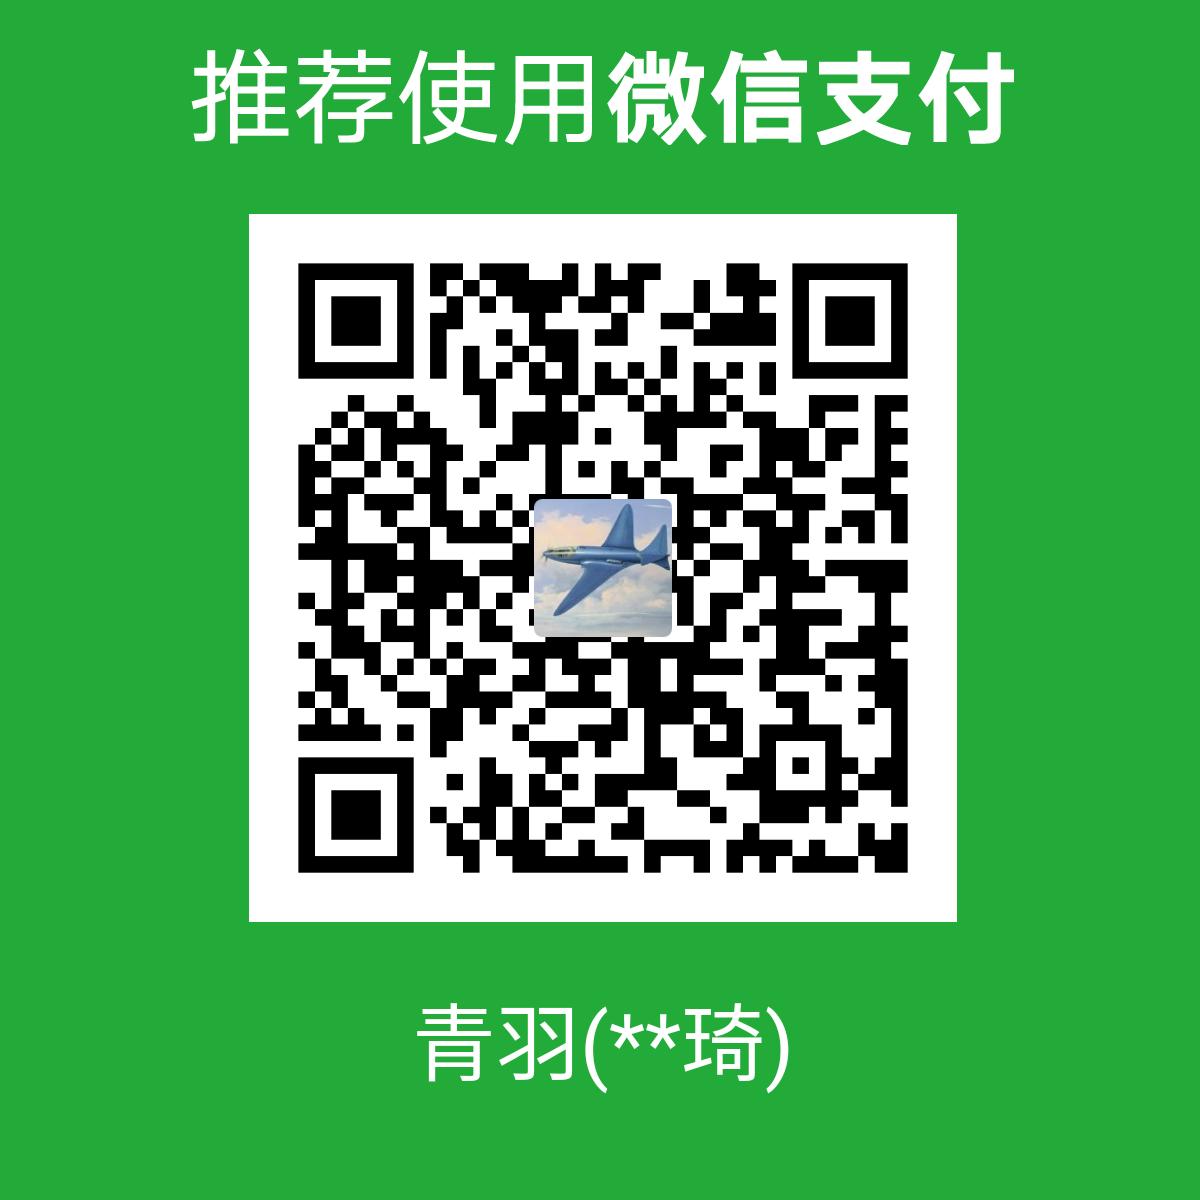 https://bugatii100peaglepics.oss-cn-qingdao.aliyuncs.com/HexoTheme/img/WX_cr.png